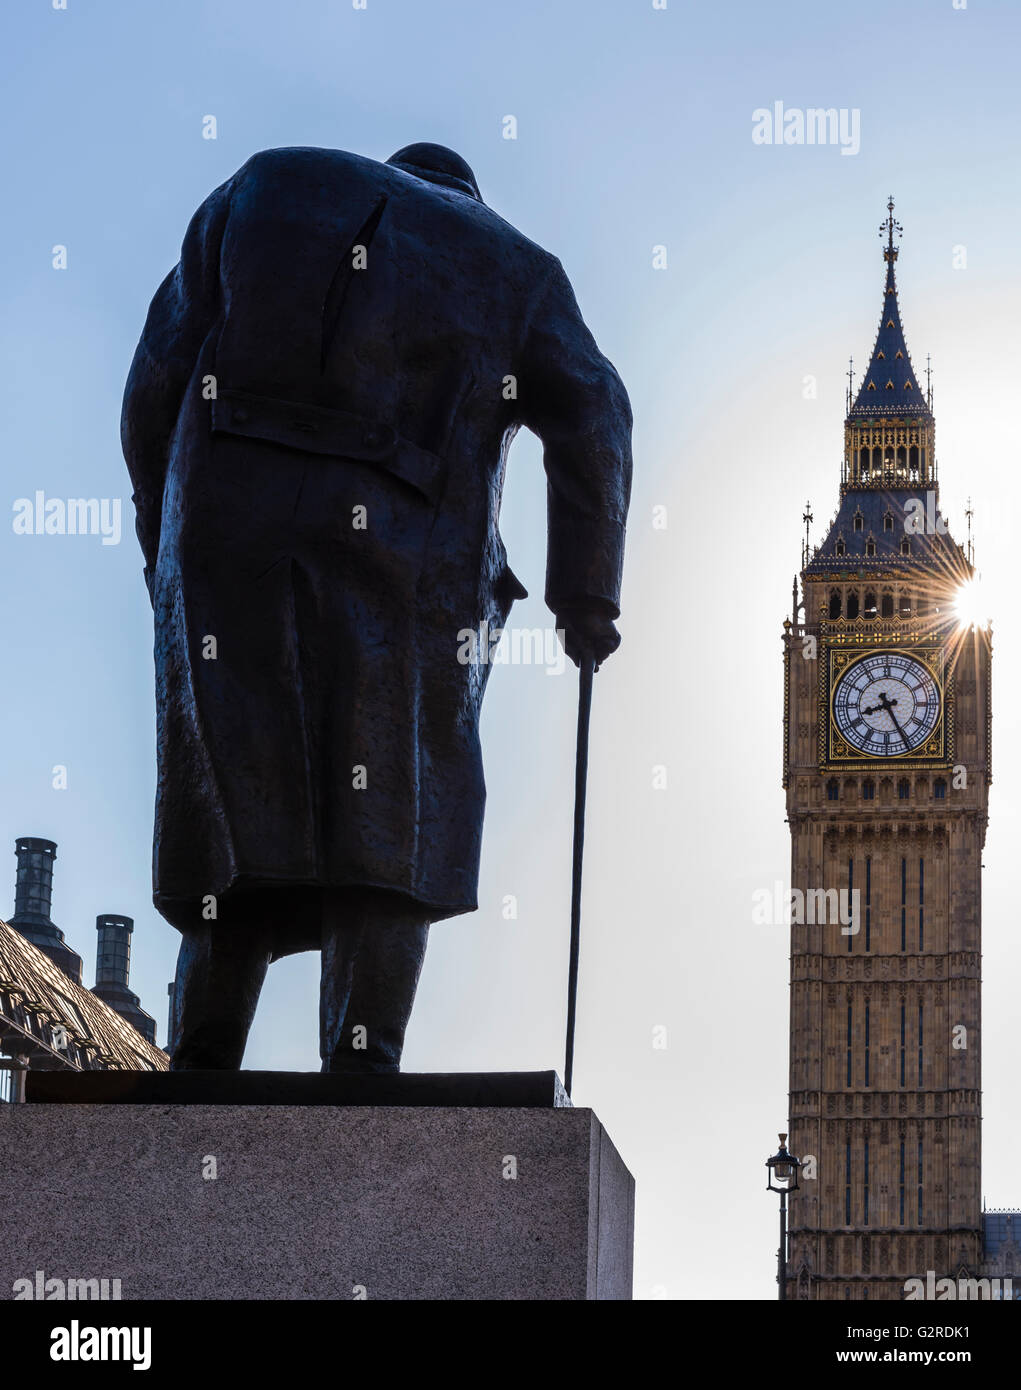 Sonne direkt neben Big Ben und Parliament Square, Westminster, London, UK. Stockbild